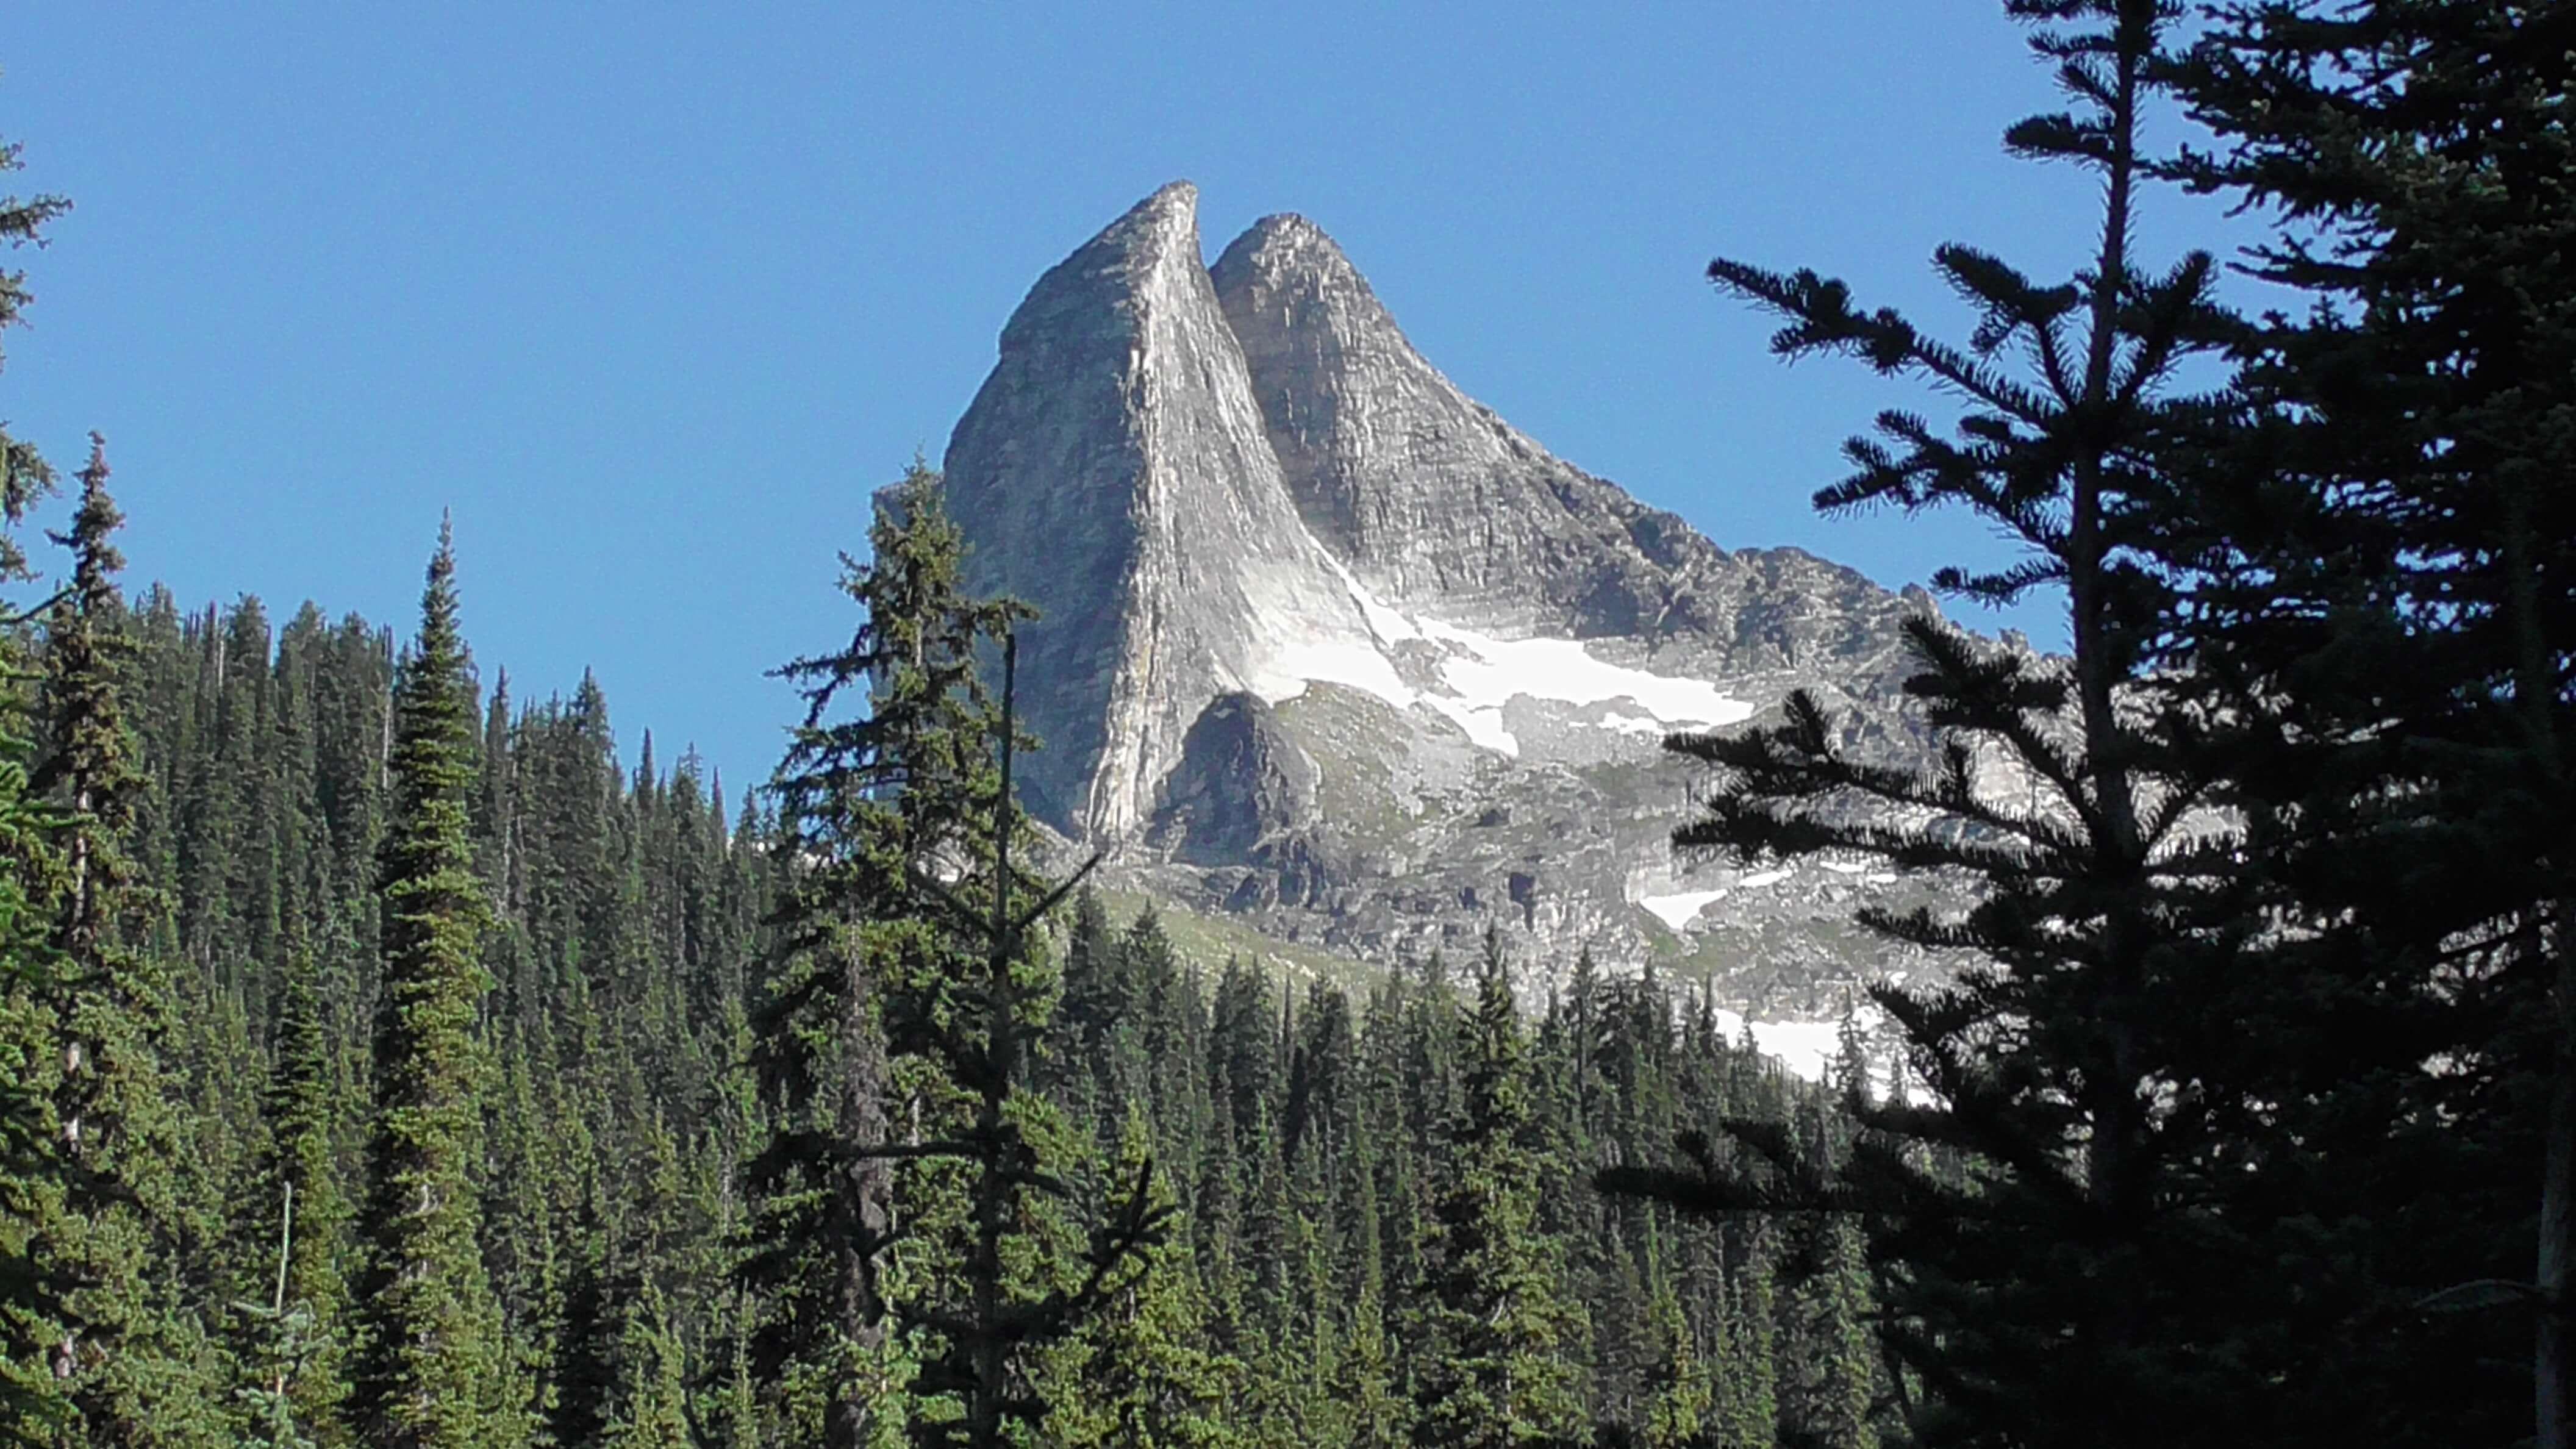 Mount Gimli, Valhalla Provincial Park, British Columbia